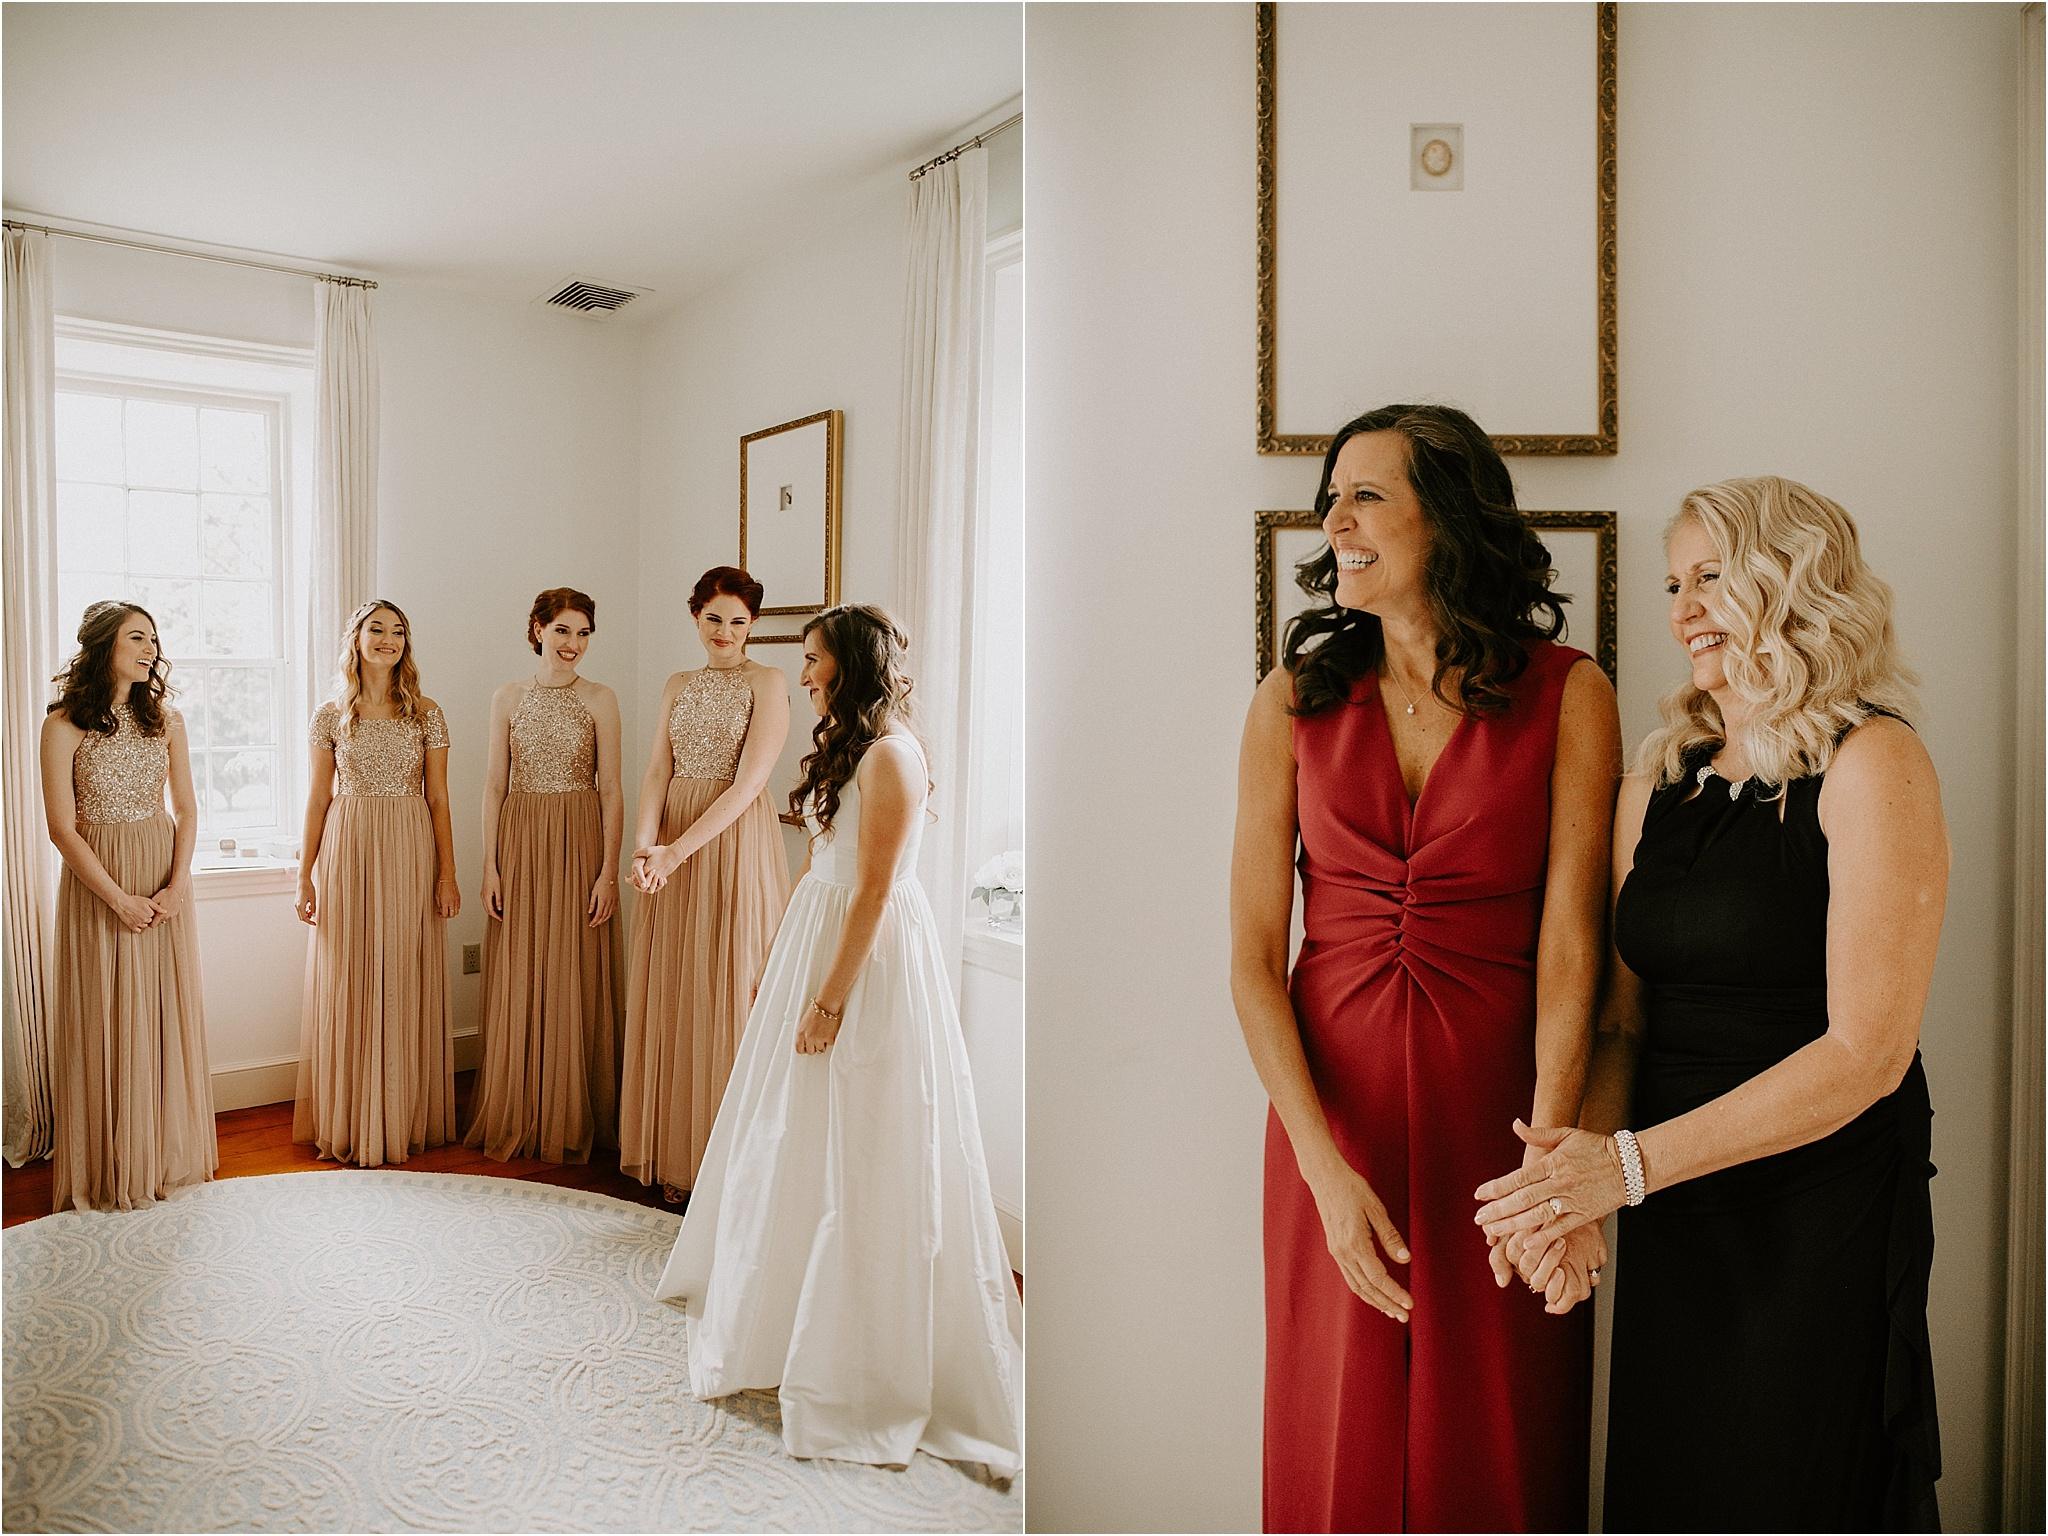 Sarah_Brookhart_Farm_at_Eagles_Ridge_Wedding_Photographer_0021.jpg